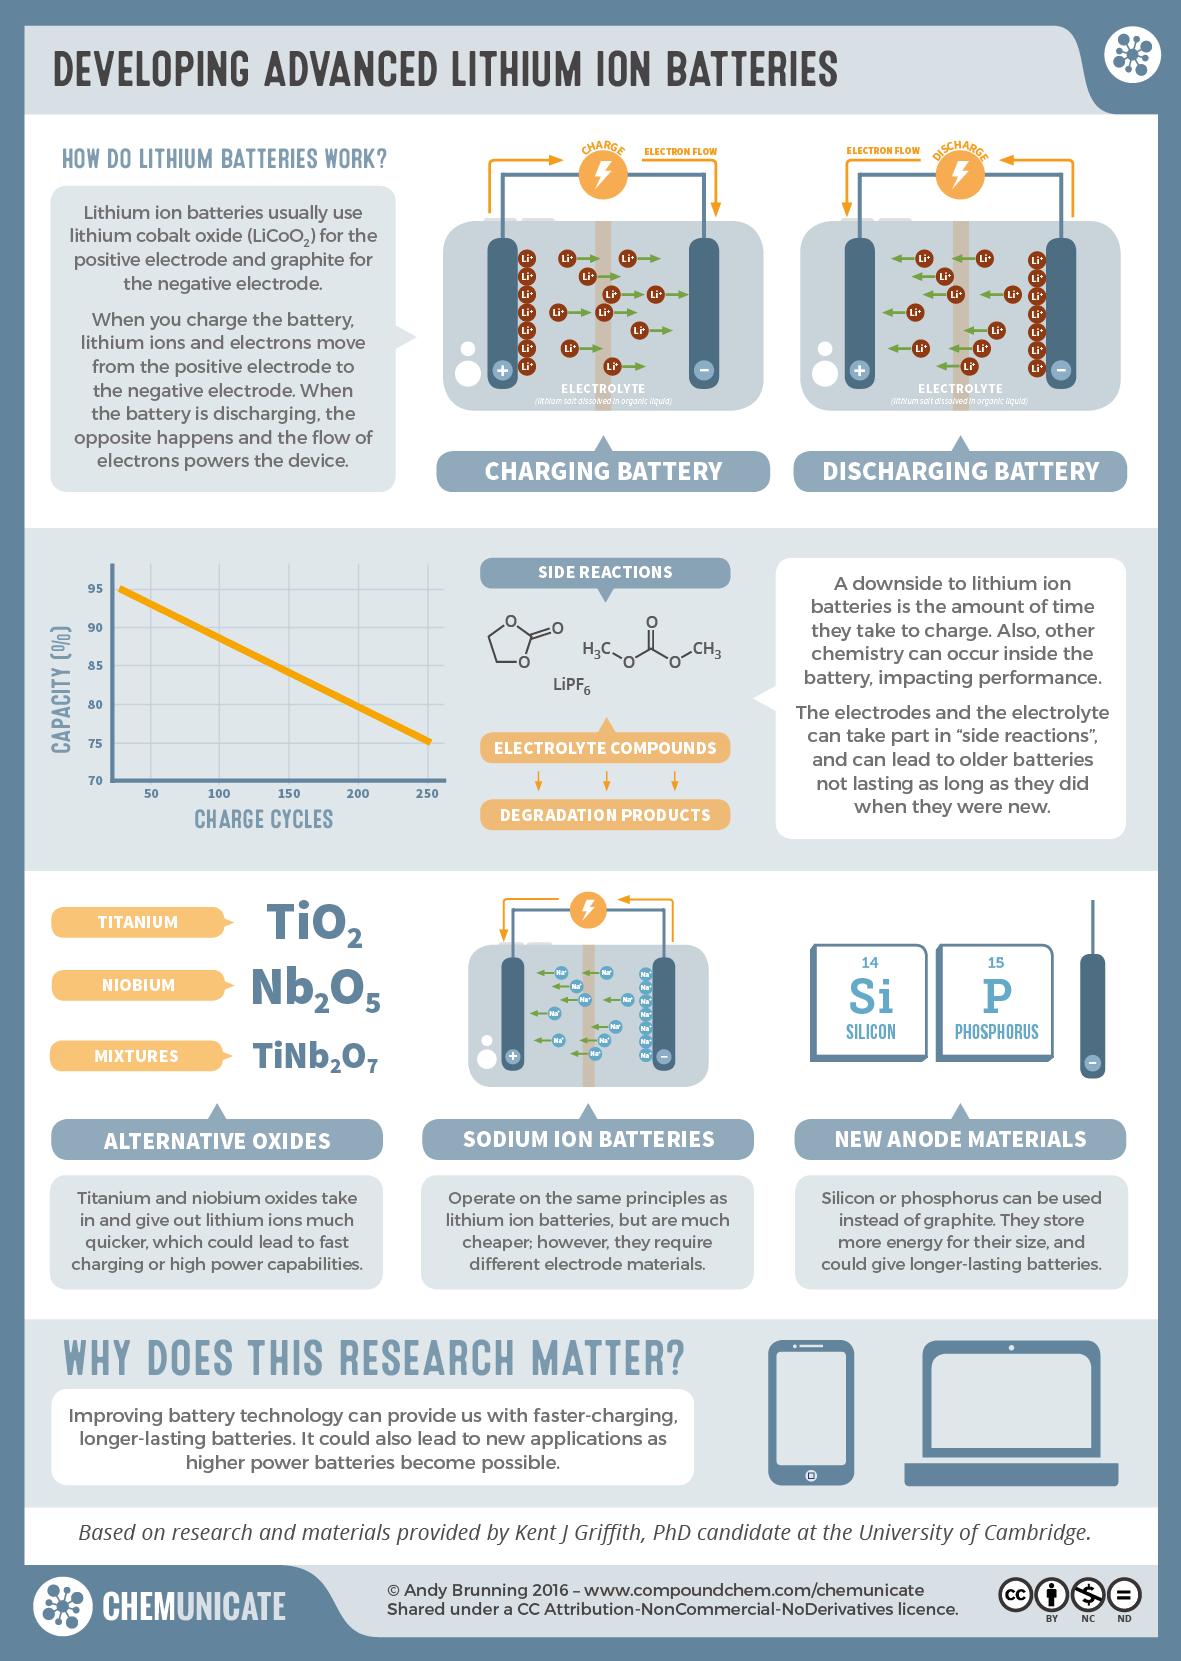 Realtimechem Week Developing Advanced Lithium Ion Batteries